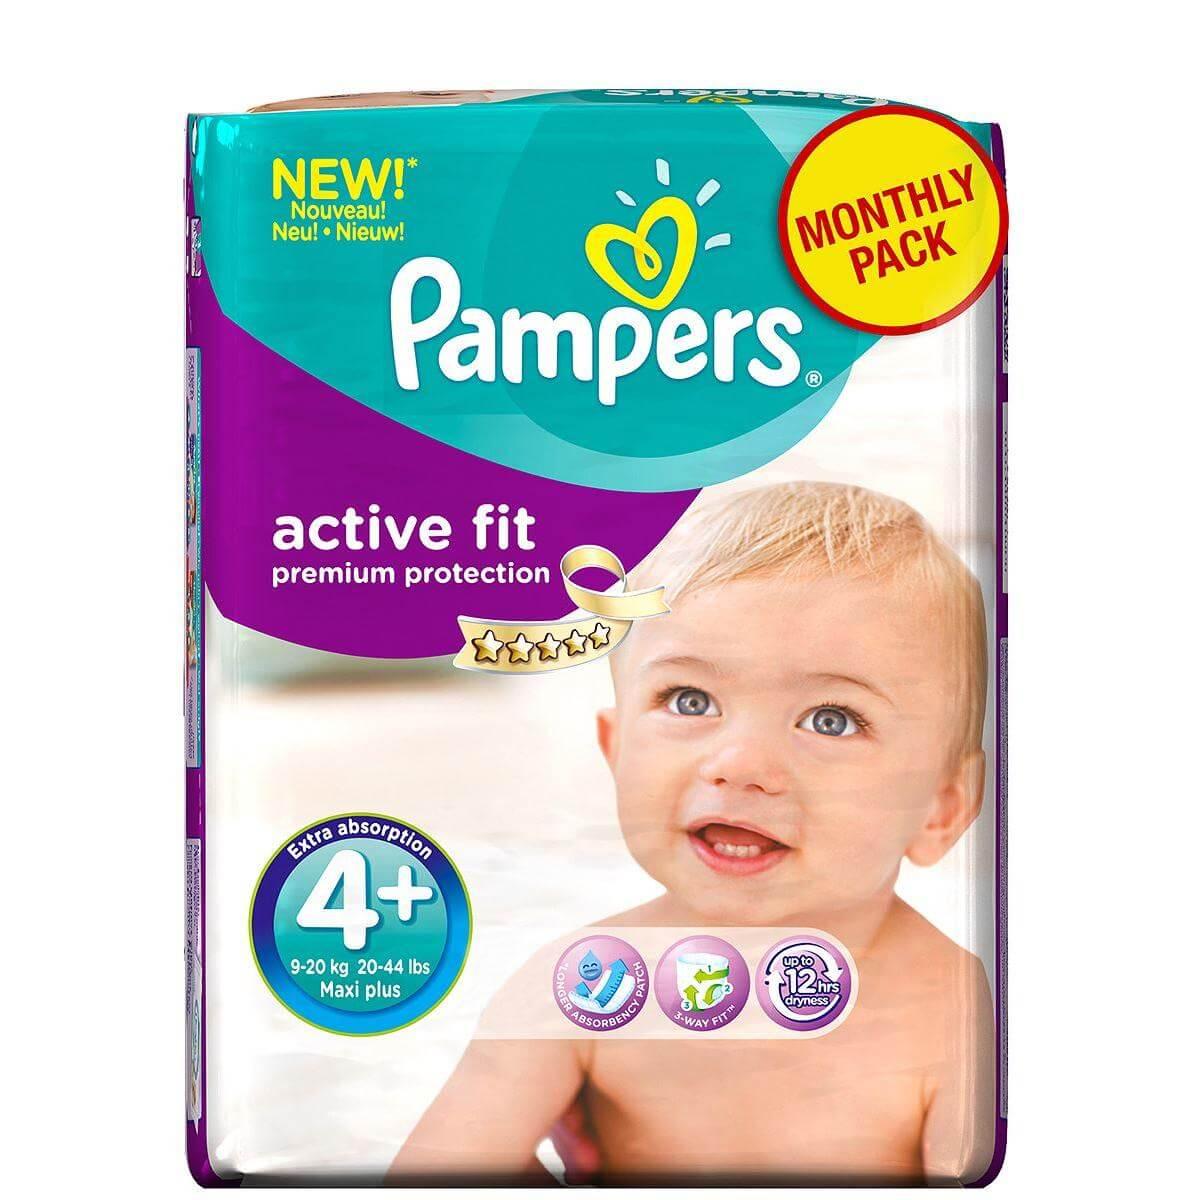 Pampers Active Fit Maxi Plus No. 4 + (9-18kg) Monthly Pack, 140 τμχ, μόνο 0,35€/ μητέρα παιδί   περιποίηση για το μωρό   πάνες